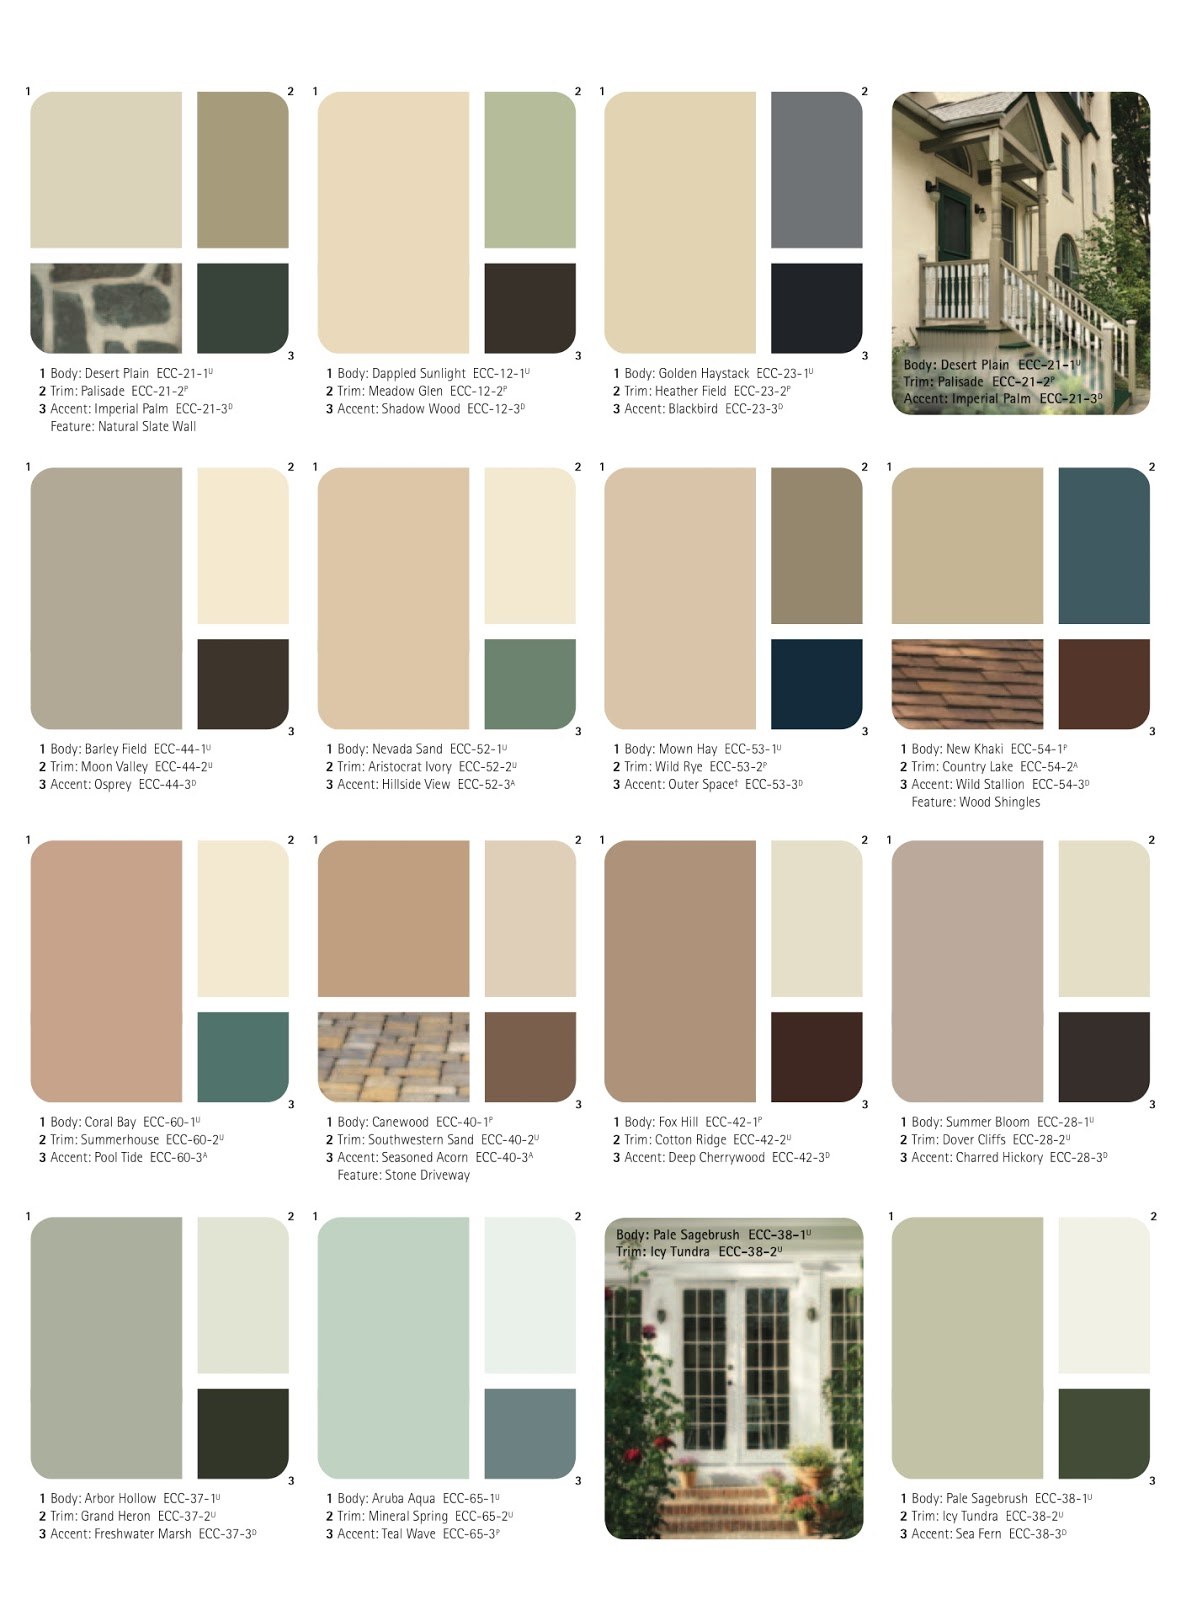 Ange's Dollhouse Choosing The Exterior Color Scheme